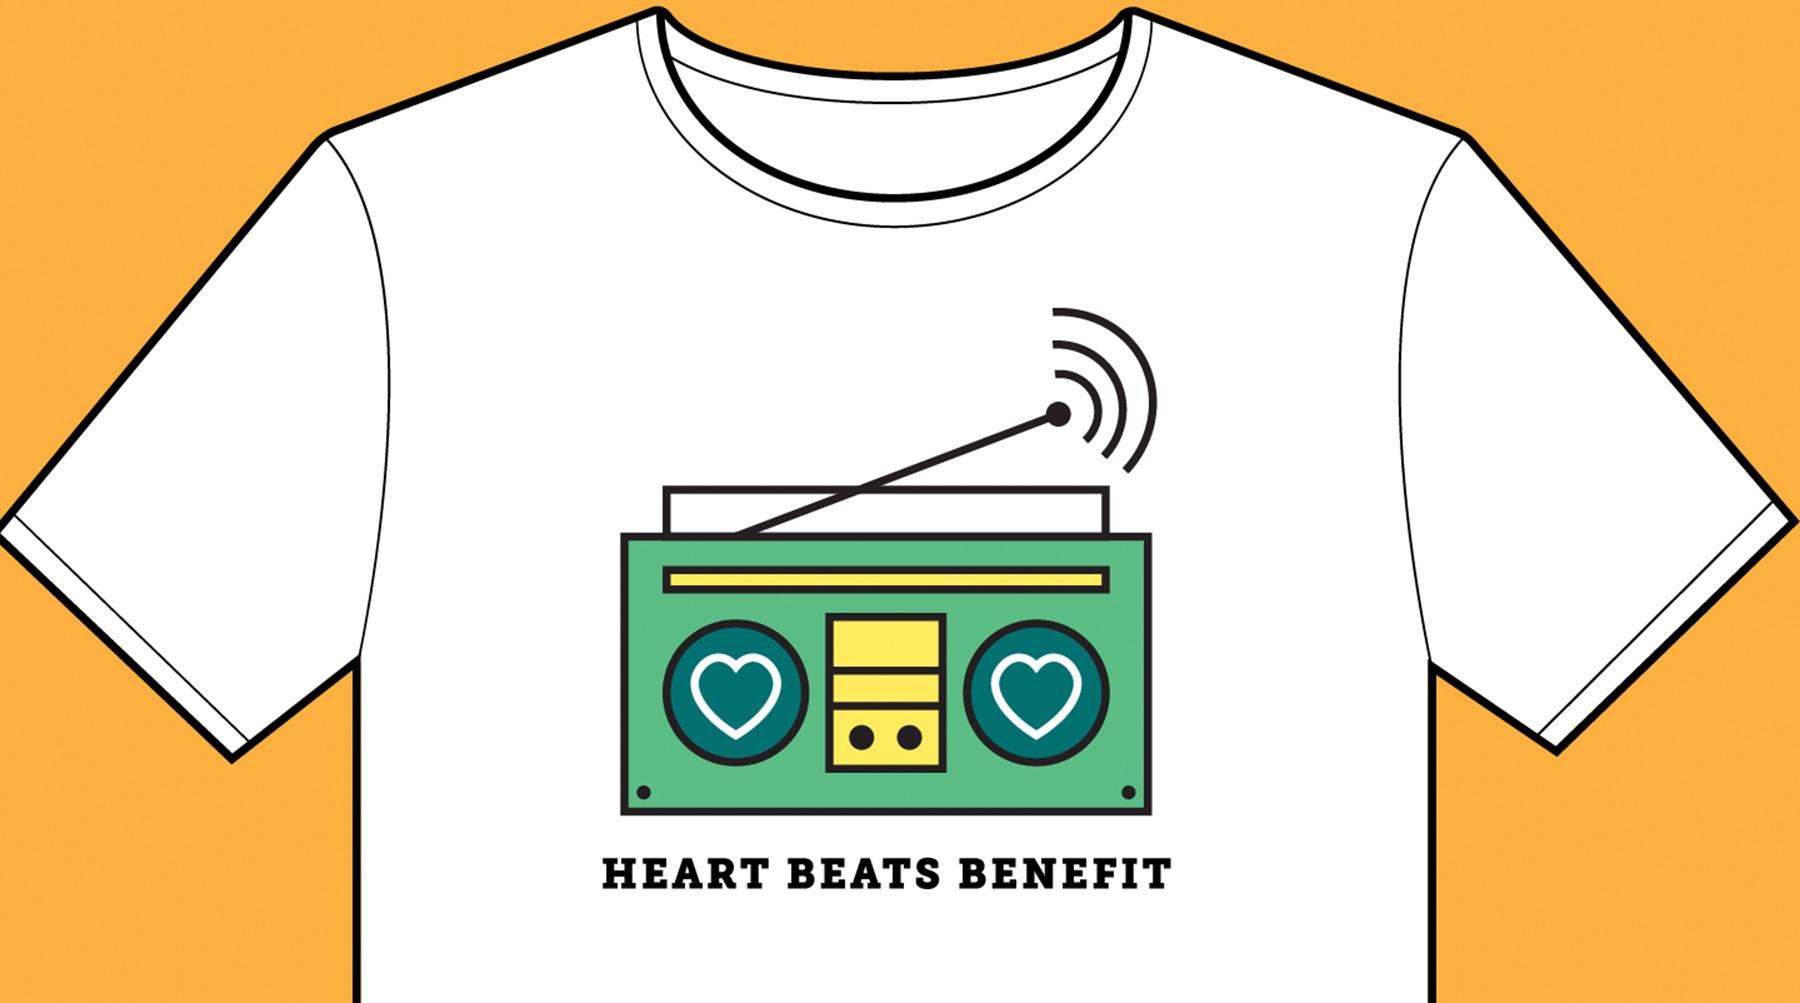 How To Design A T Shirt